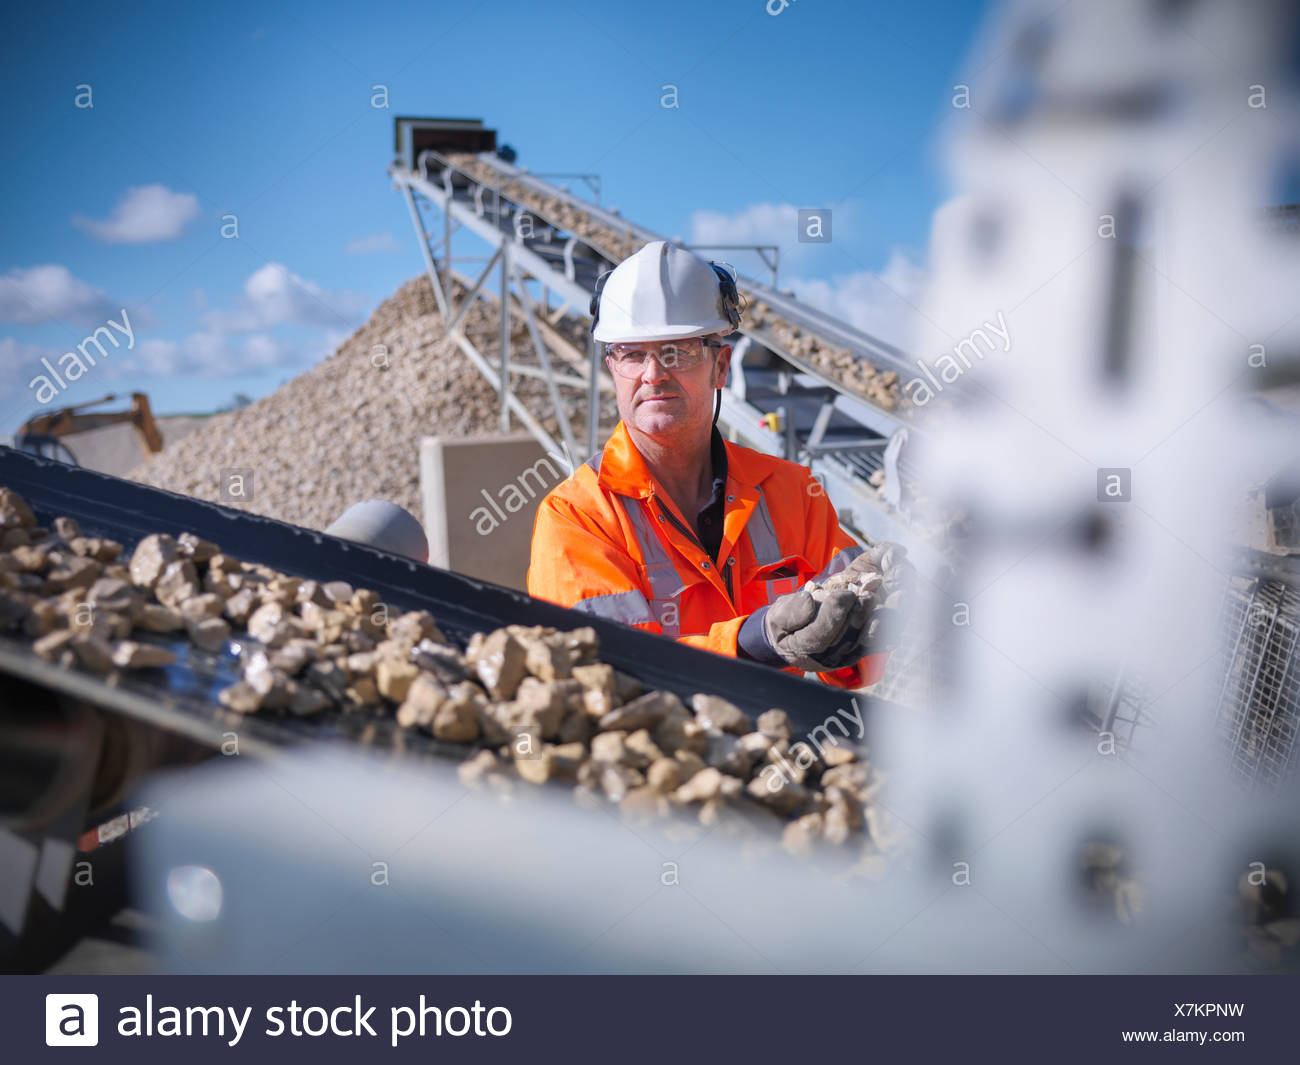 Worker examining stones on conveyor belt - Stock Image